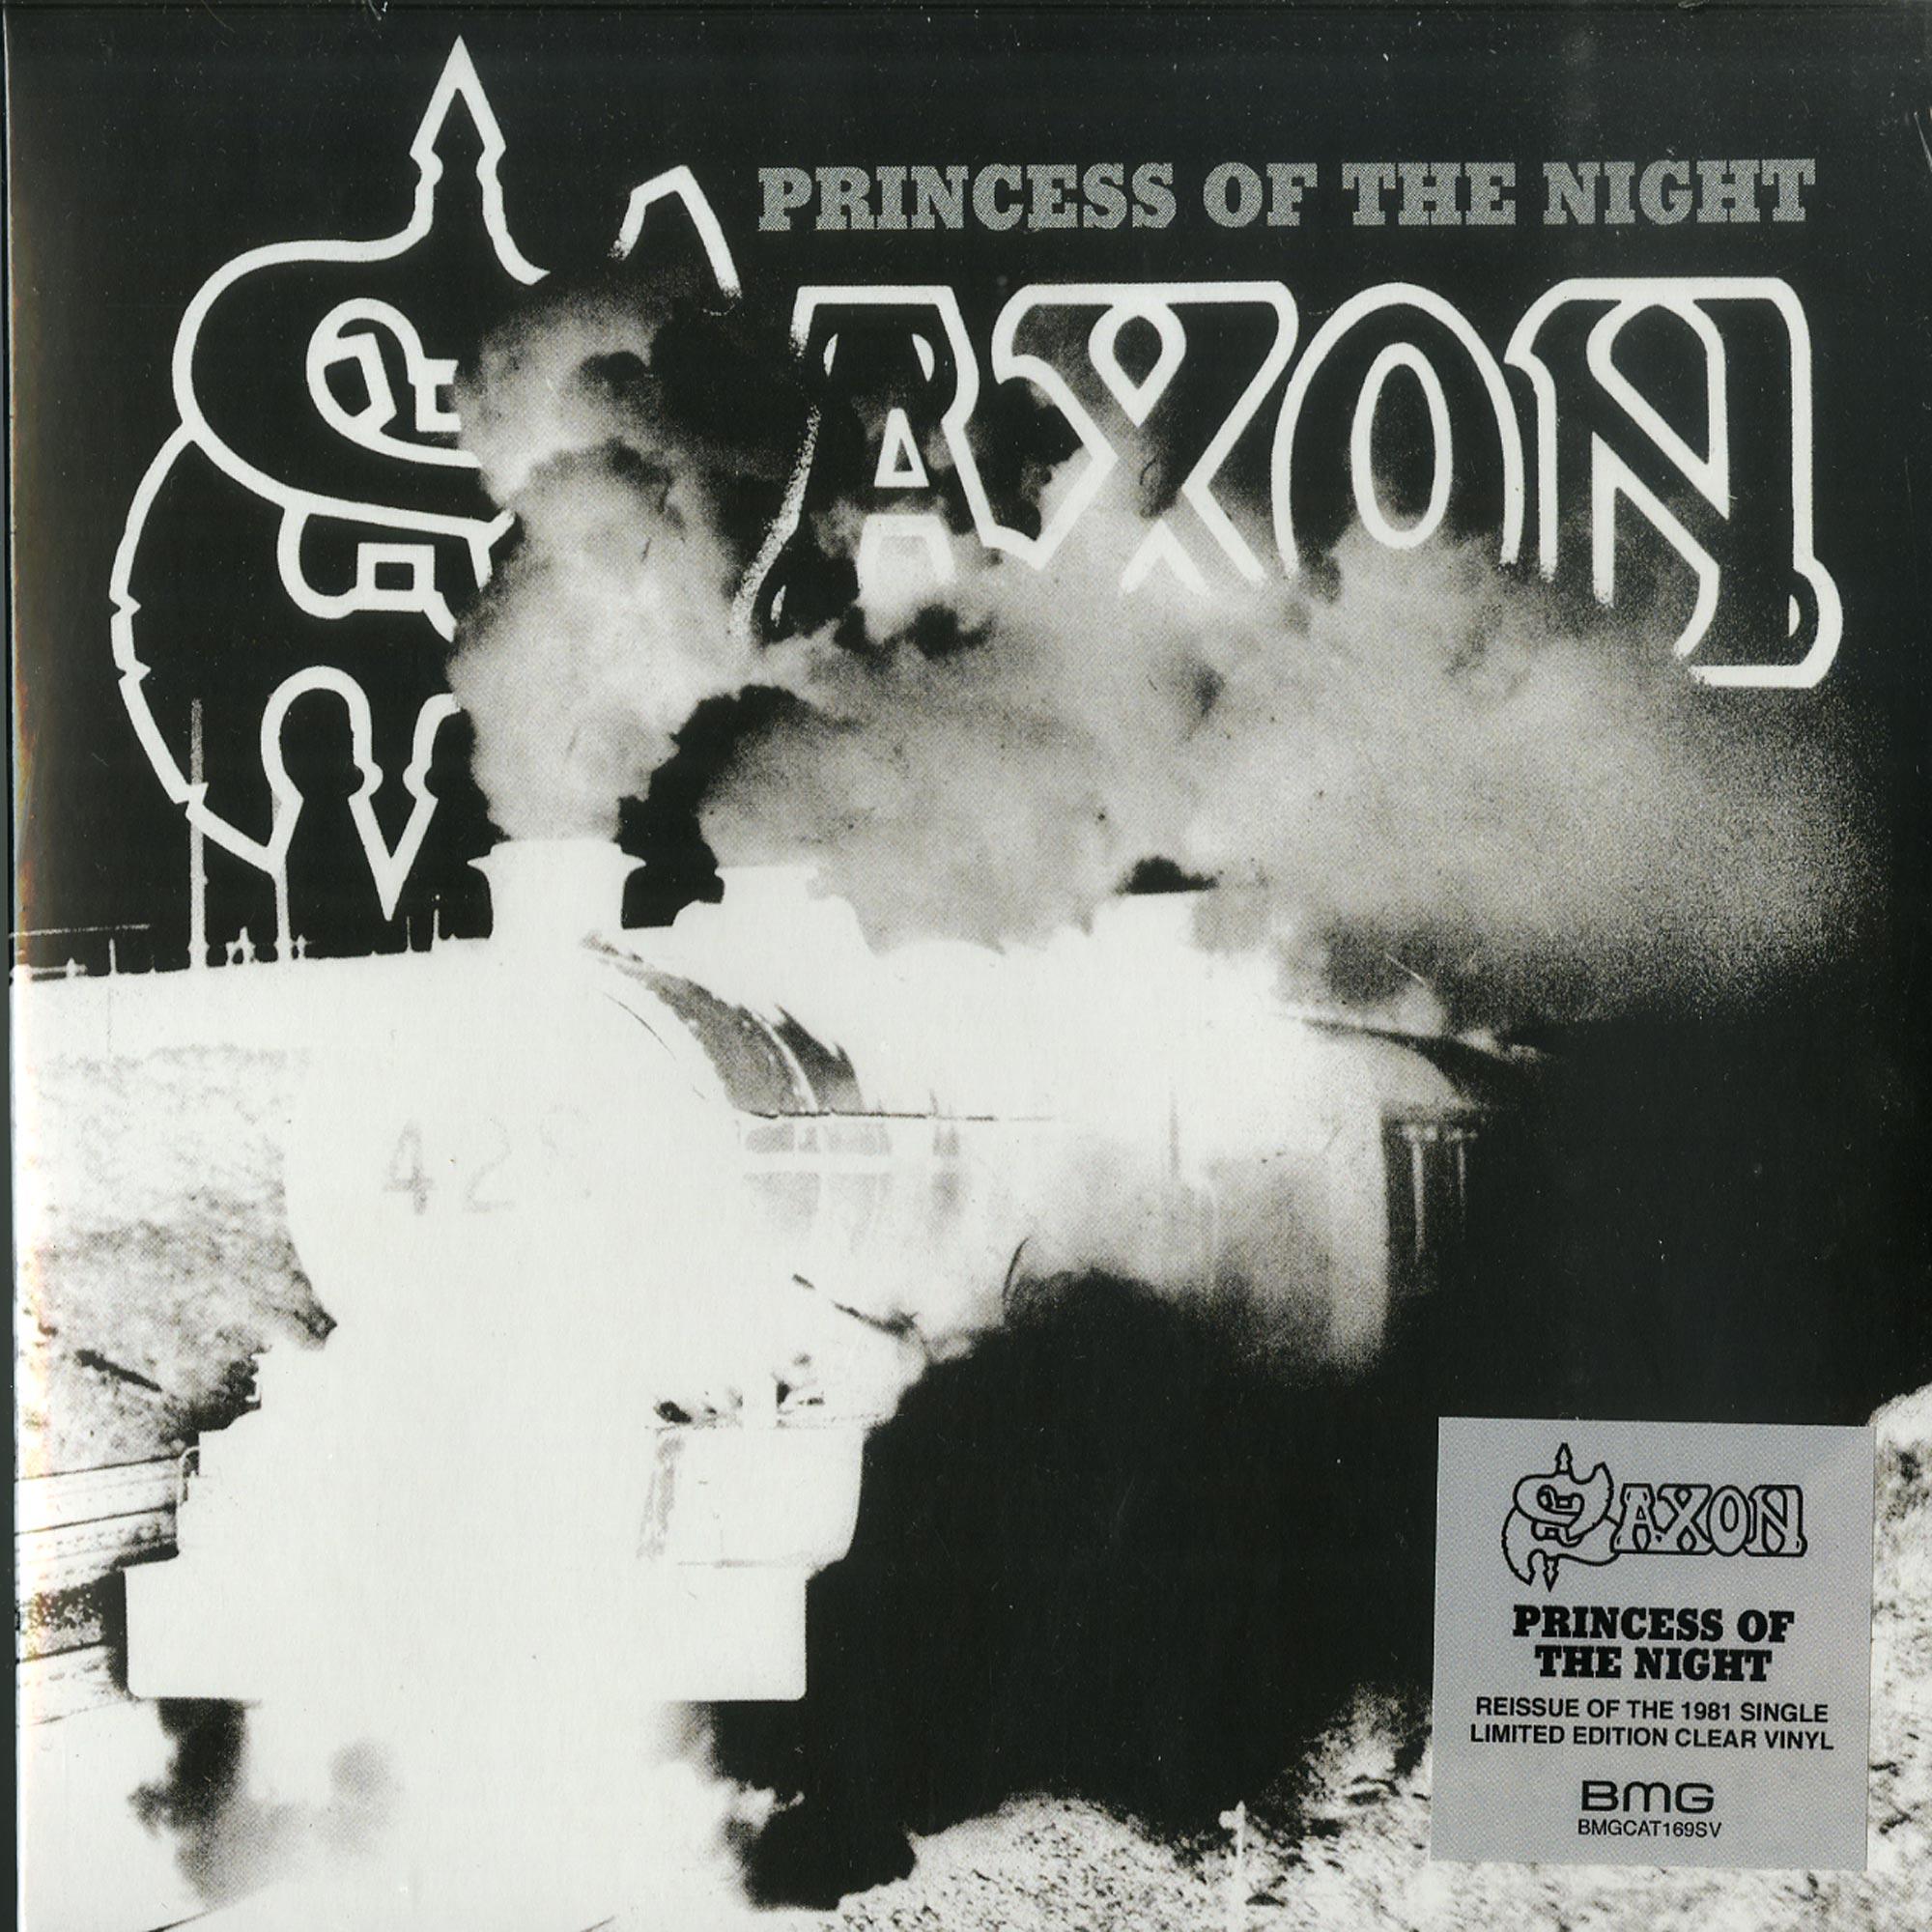 Saxon - PRINCESS OF THE NIGHT